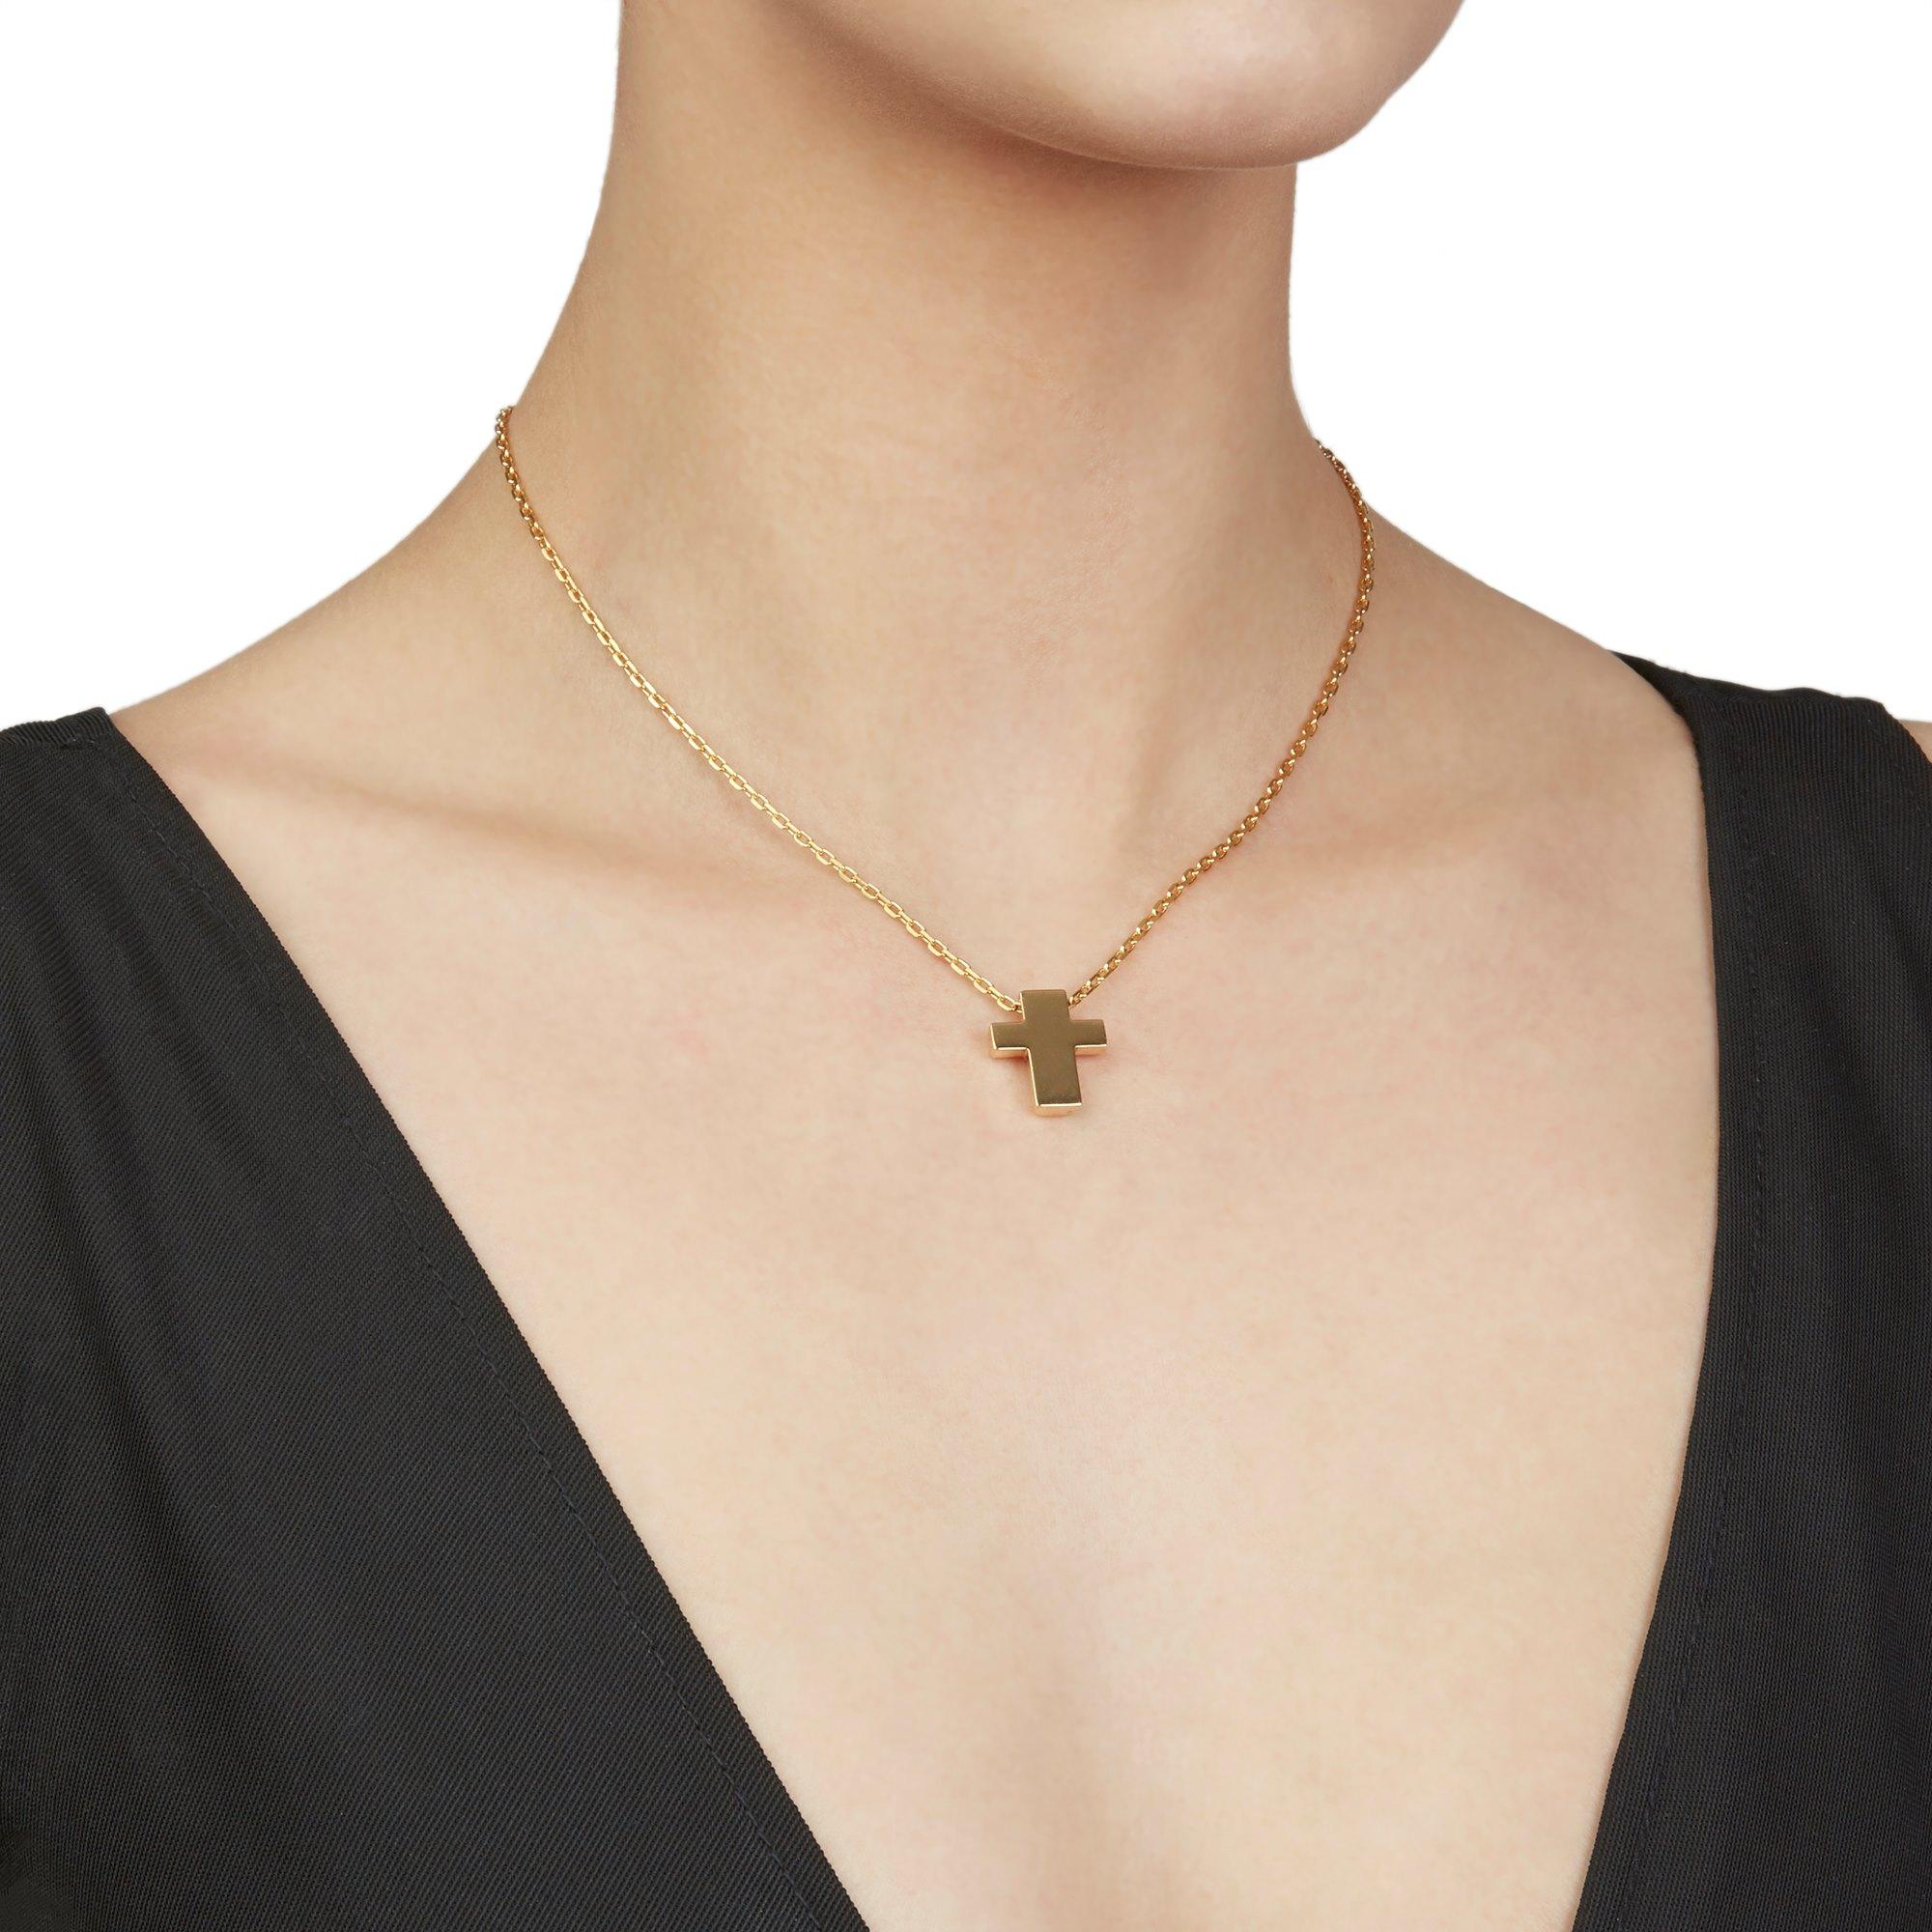 Asprey 18k Yellow Gold Cross Pendant Necklace - Image 2 of 8